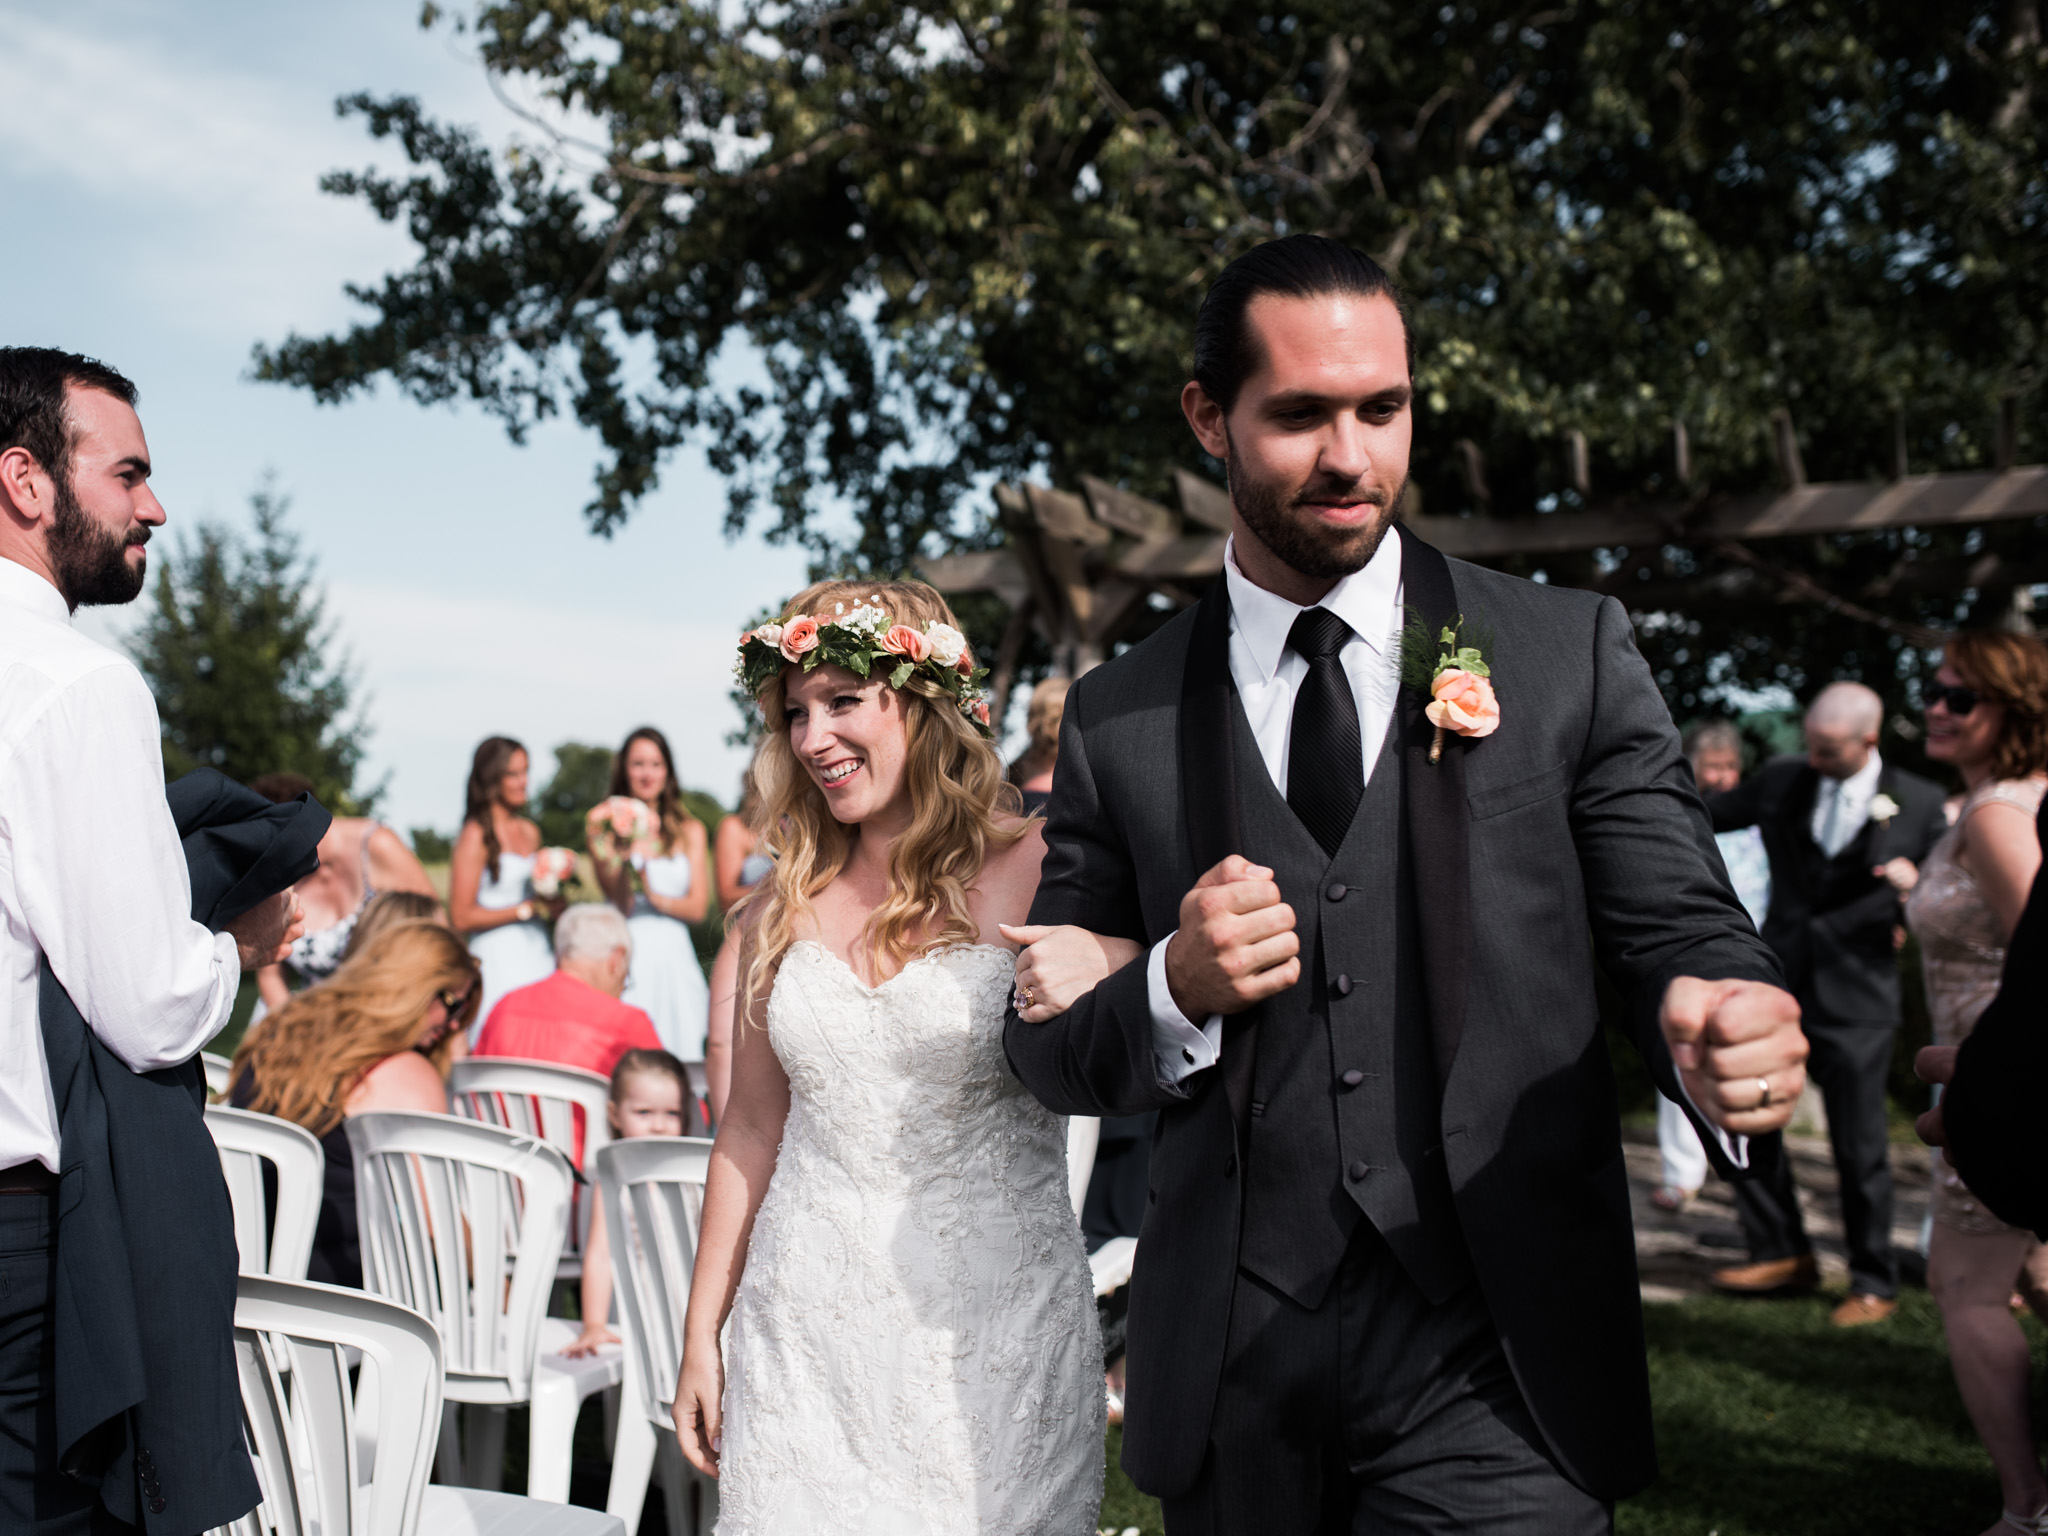 Fields-on-westlake-wedding-fiona-chiu-photography-26.jpg